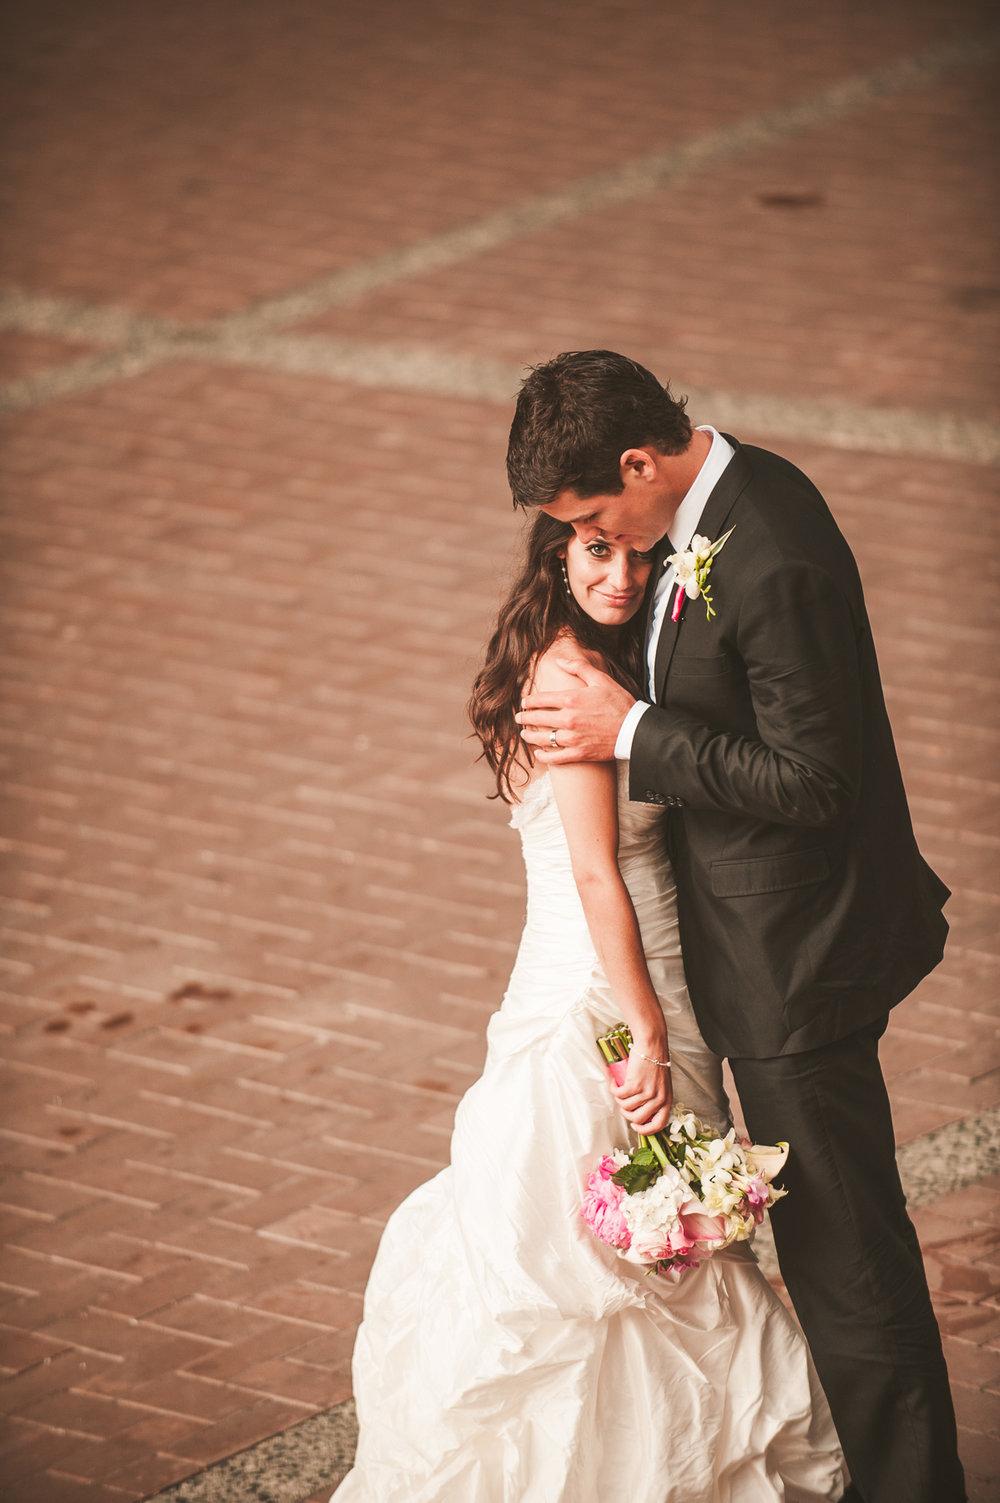 Victoria-BC-Wedding-Photography-28.jpg